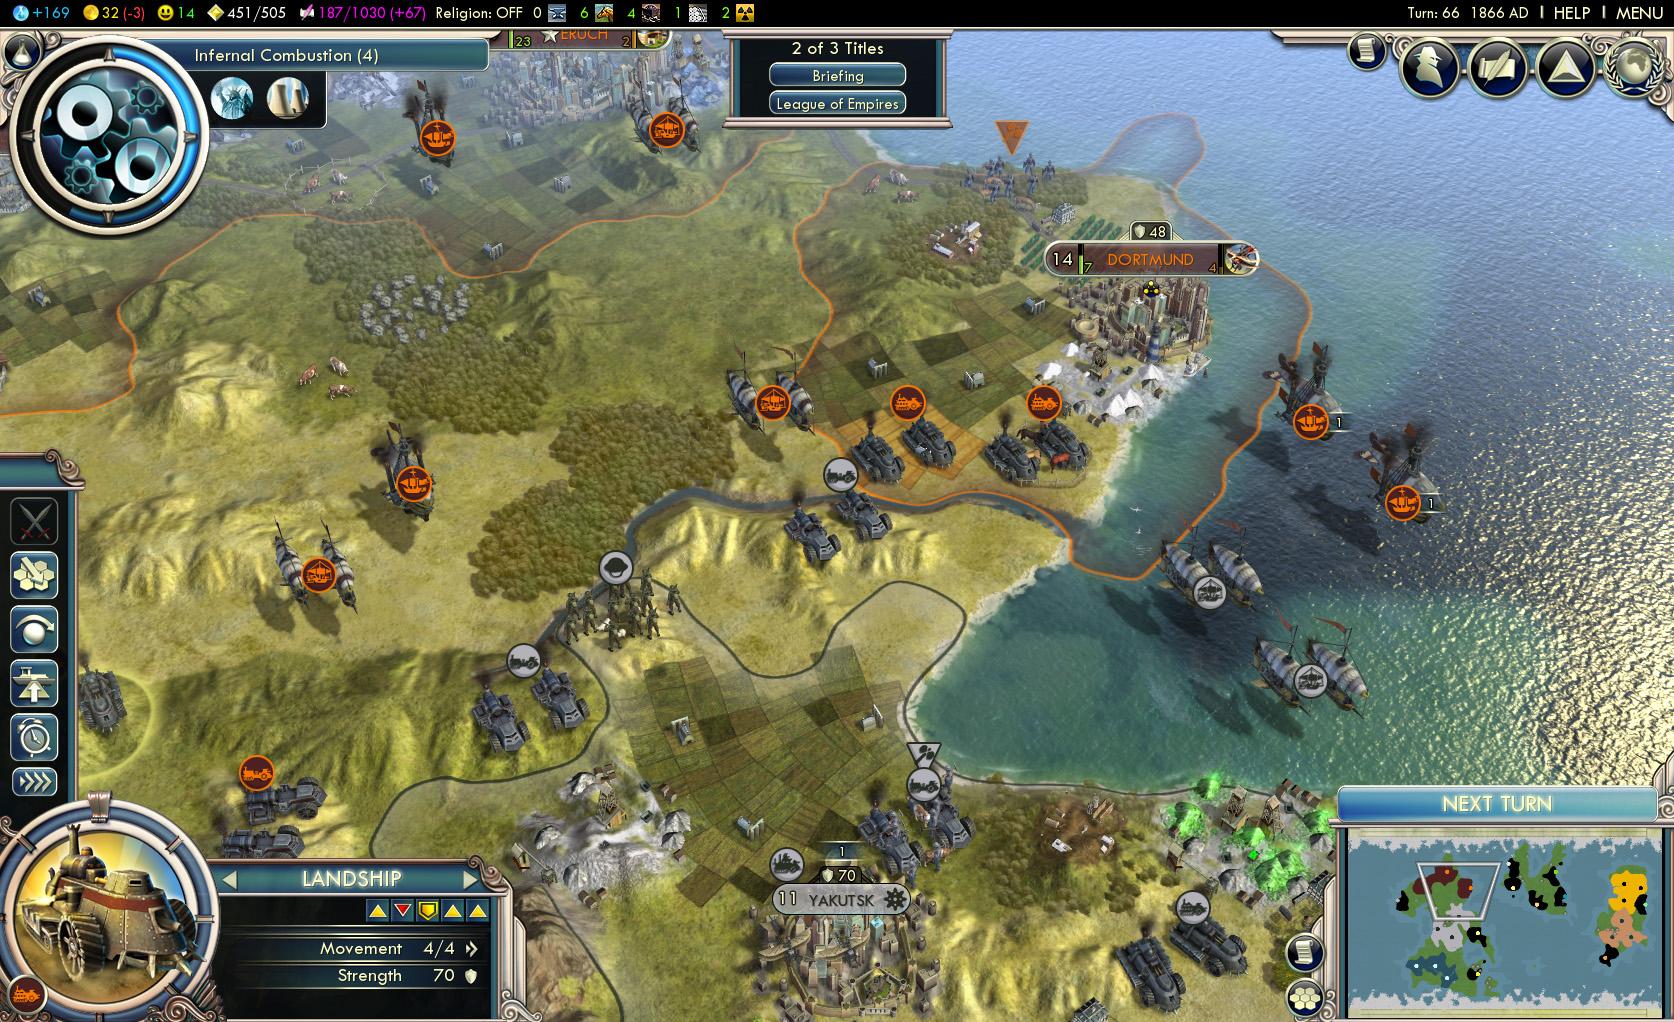 Empires of the Smoky Skies (Civ5) | Civilization Wiki | FANDOM